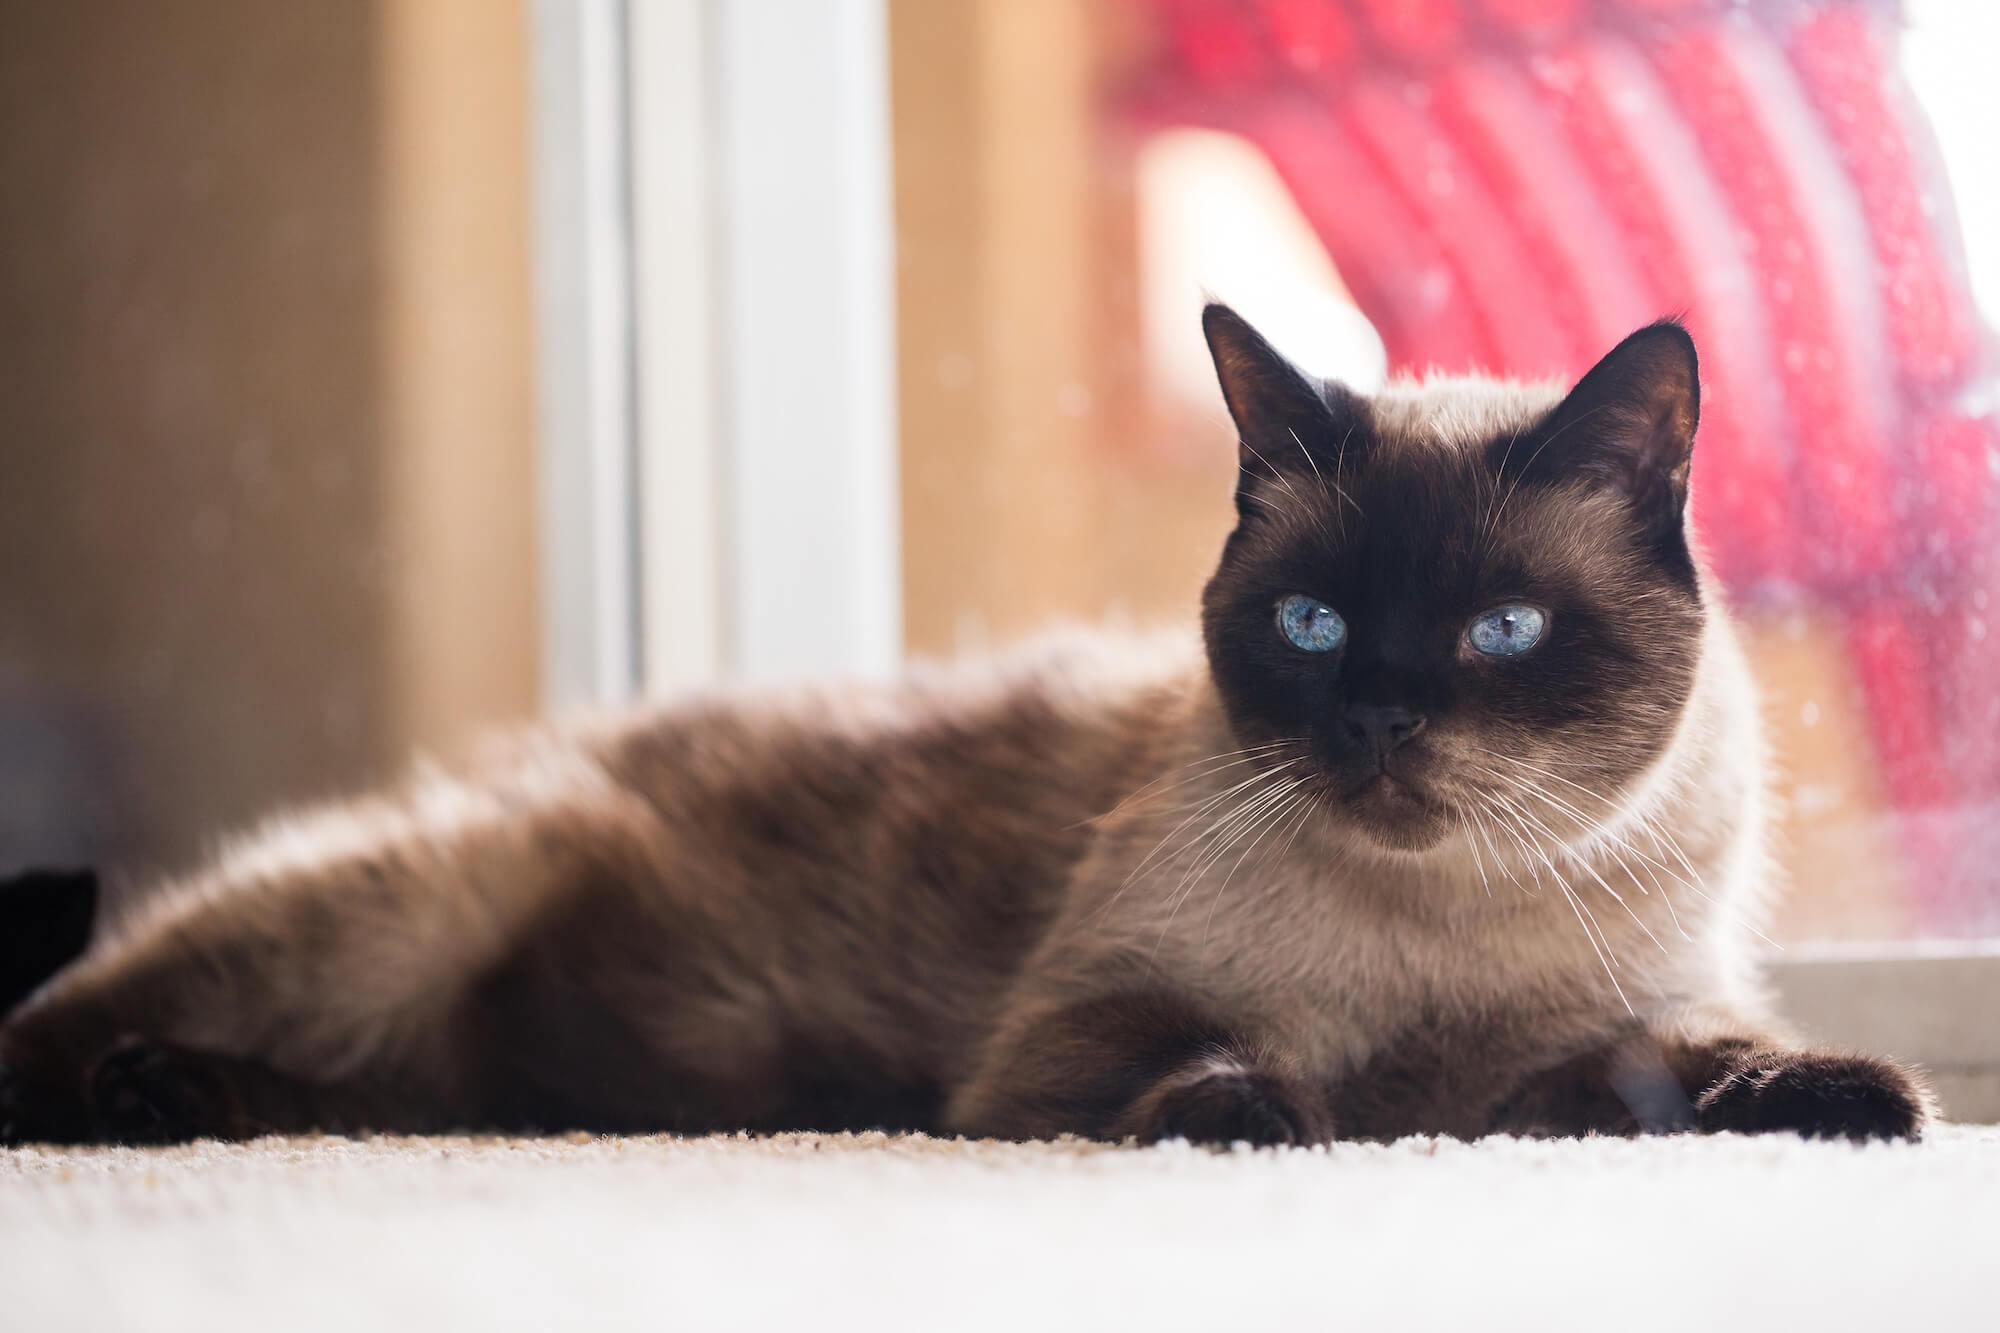 cat lays in front of window